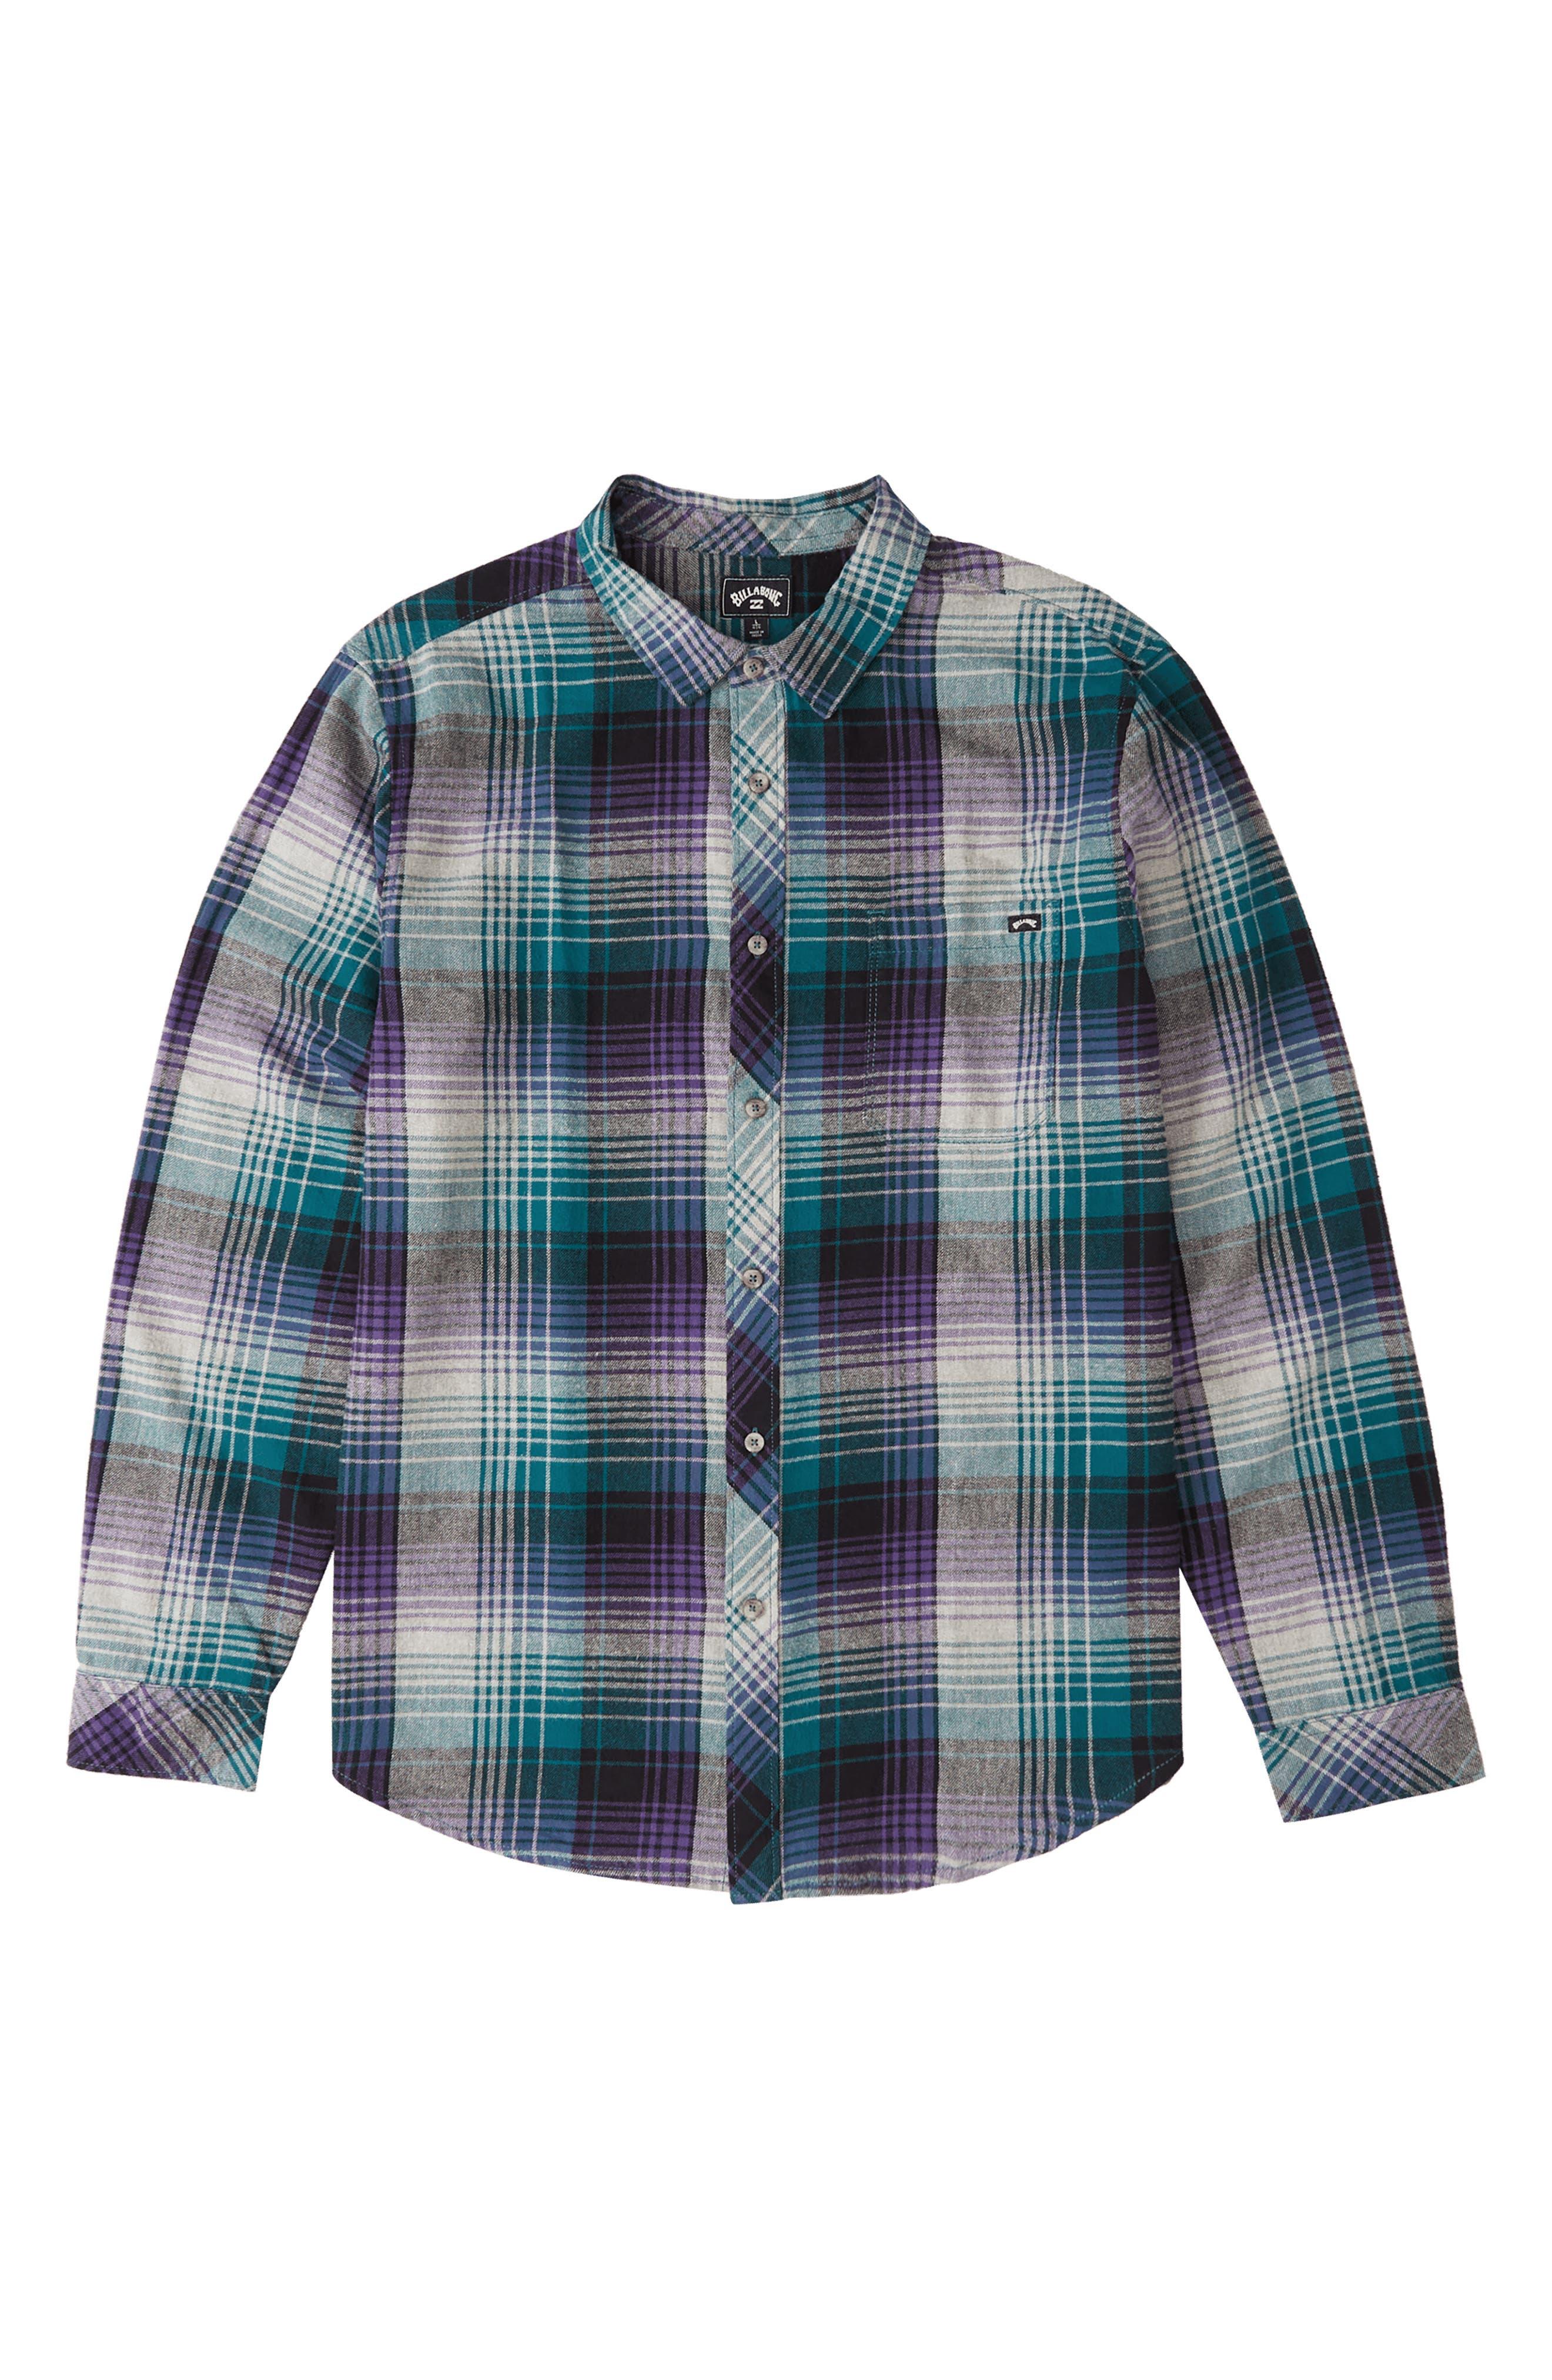 Coastline Check Flannel Button-Up Shirt